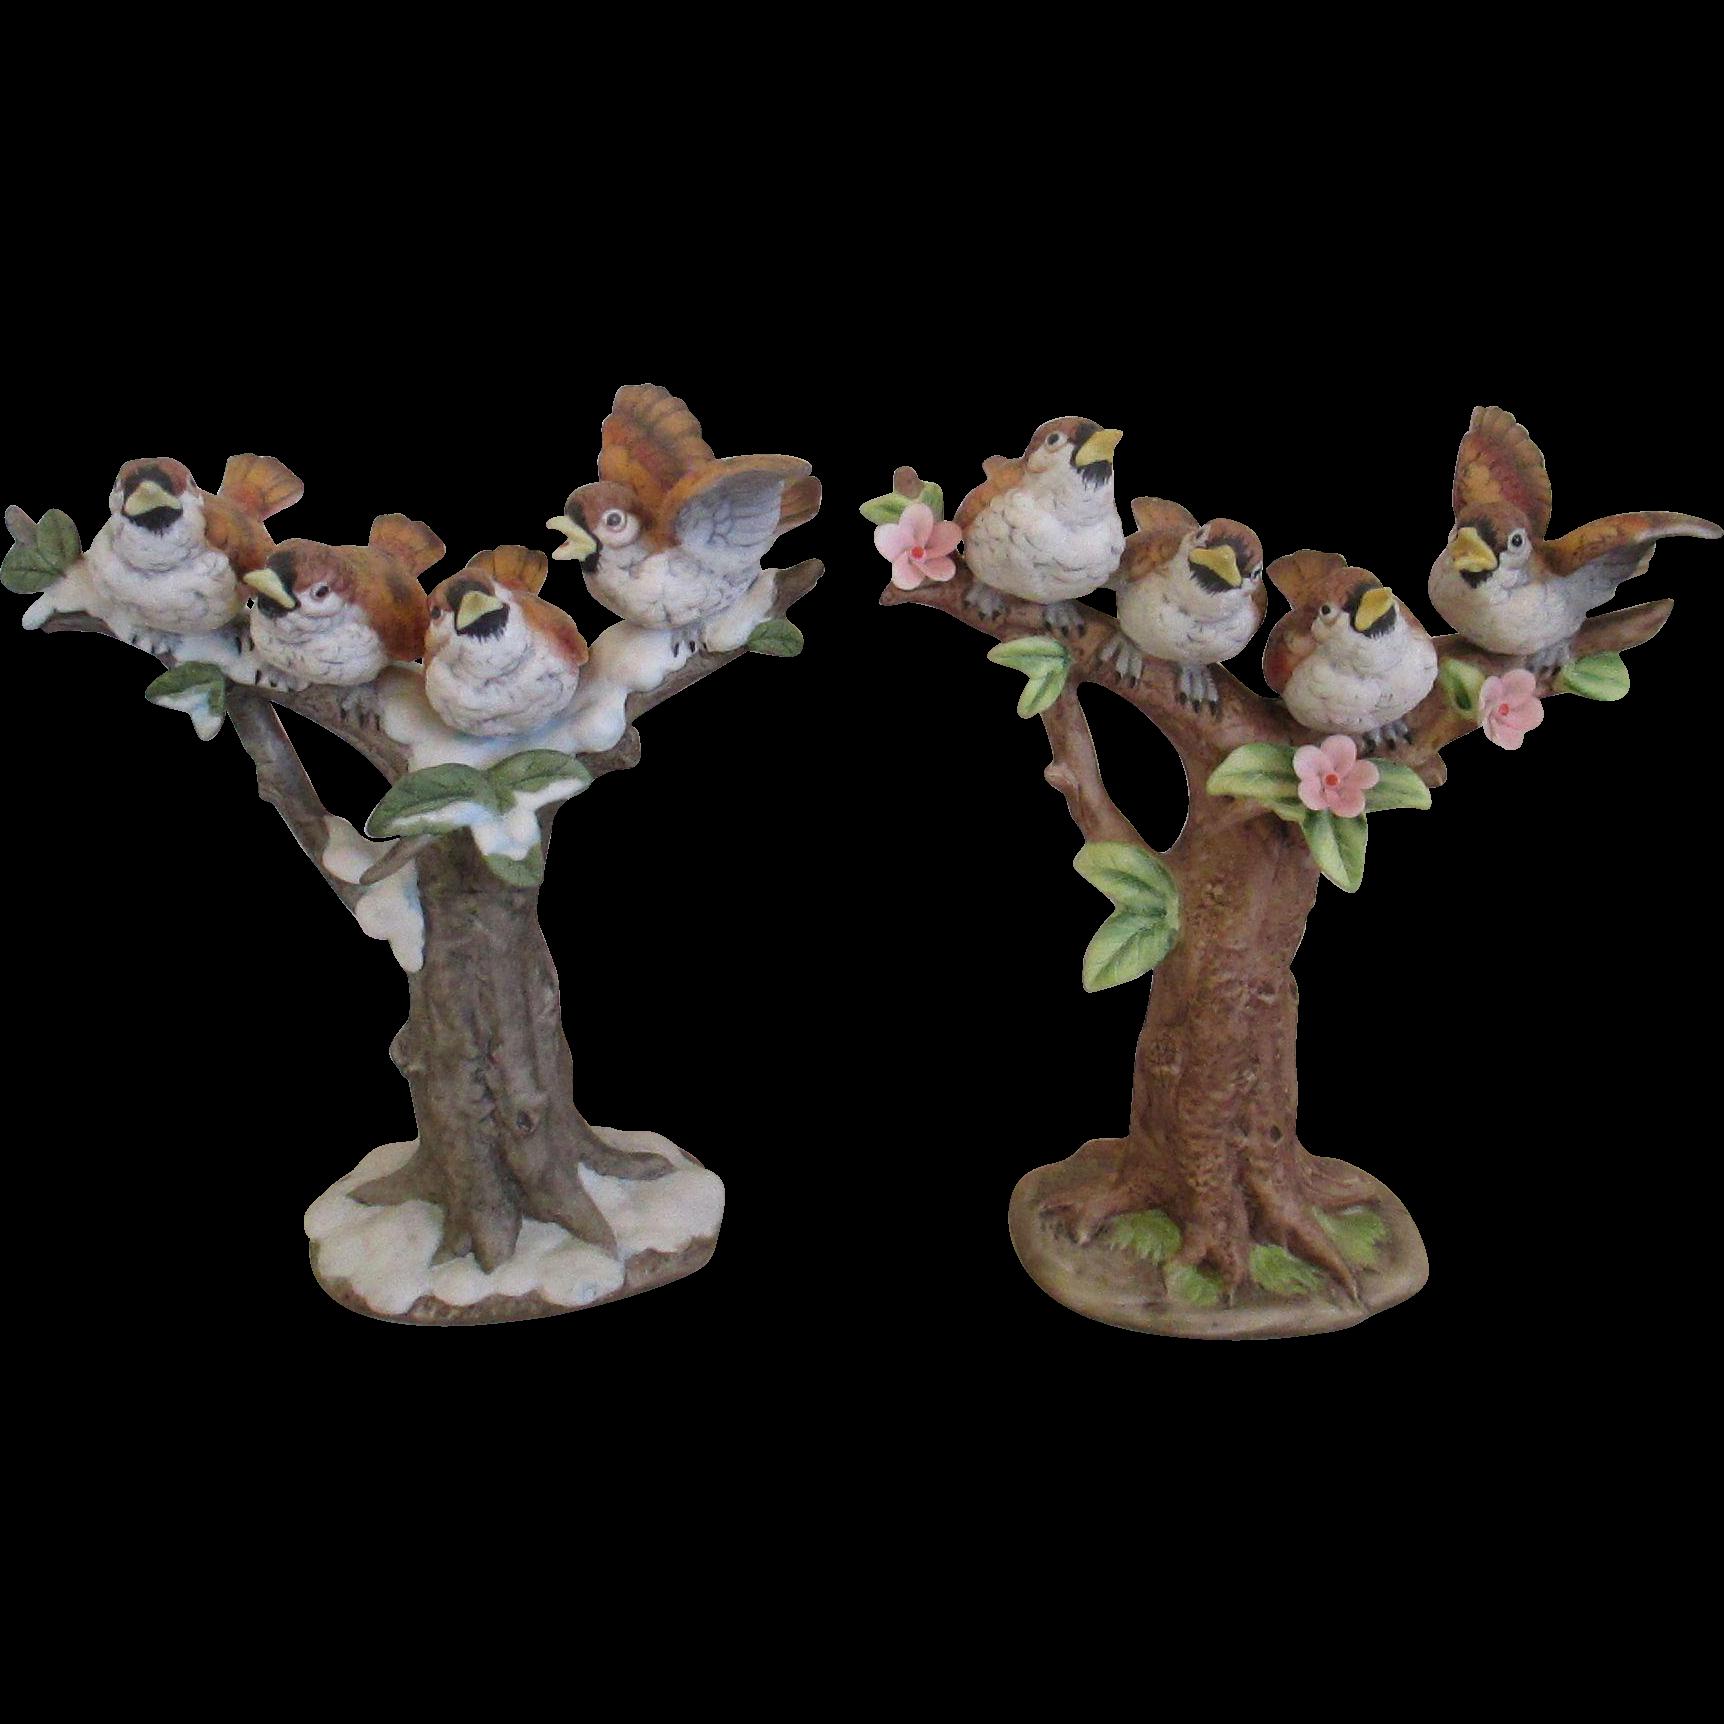 Pair of porcelain winter spring chickadee 39 s figurines from silvermoonjewelryandmore on ruby lane - Chickadee figurine ...